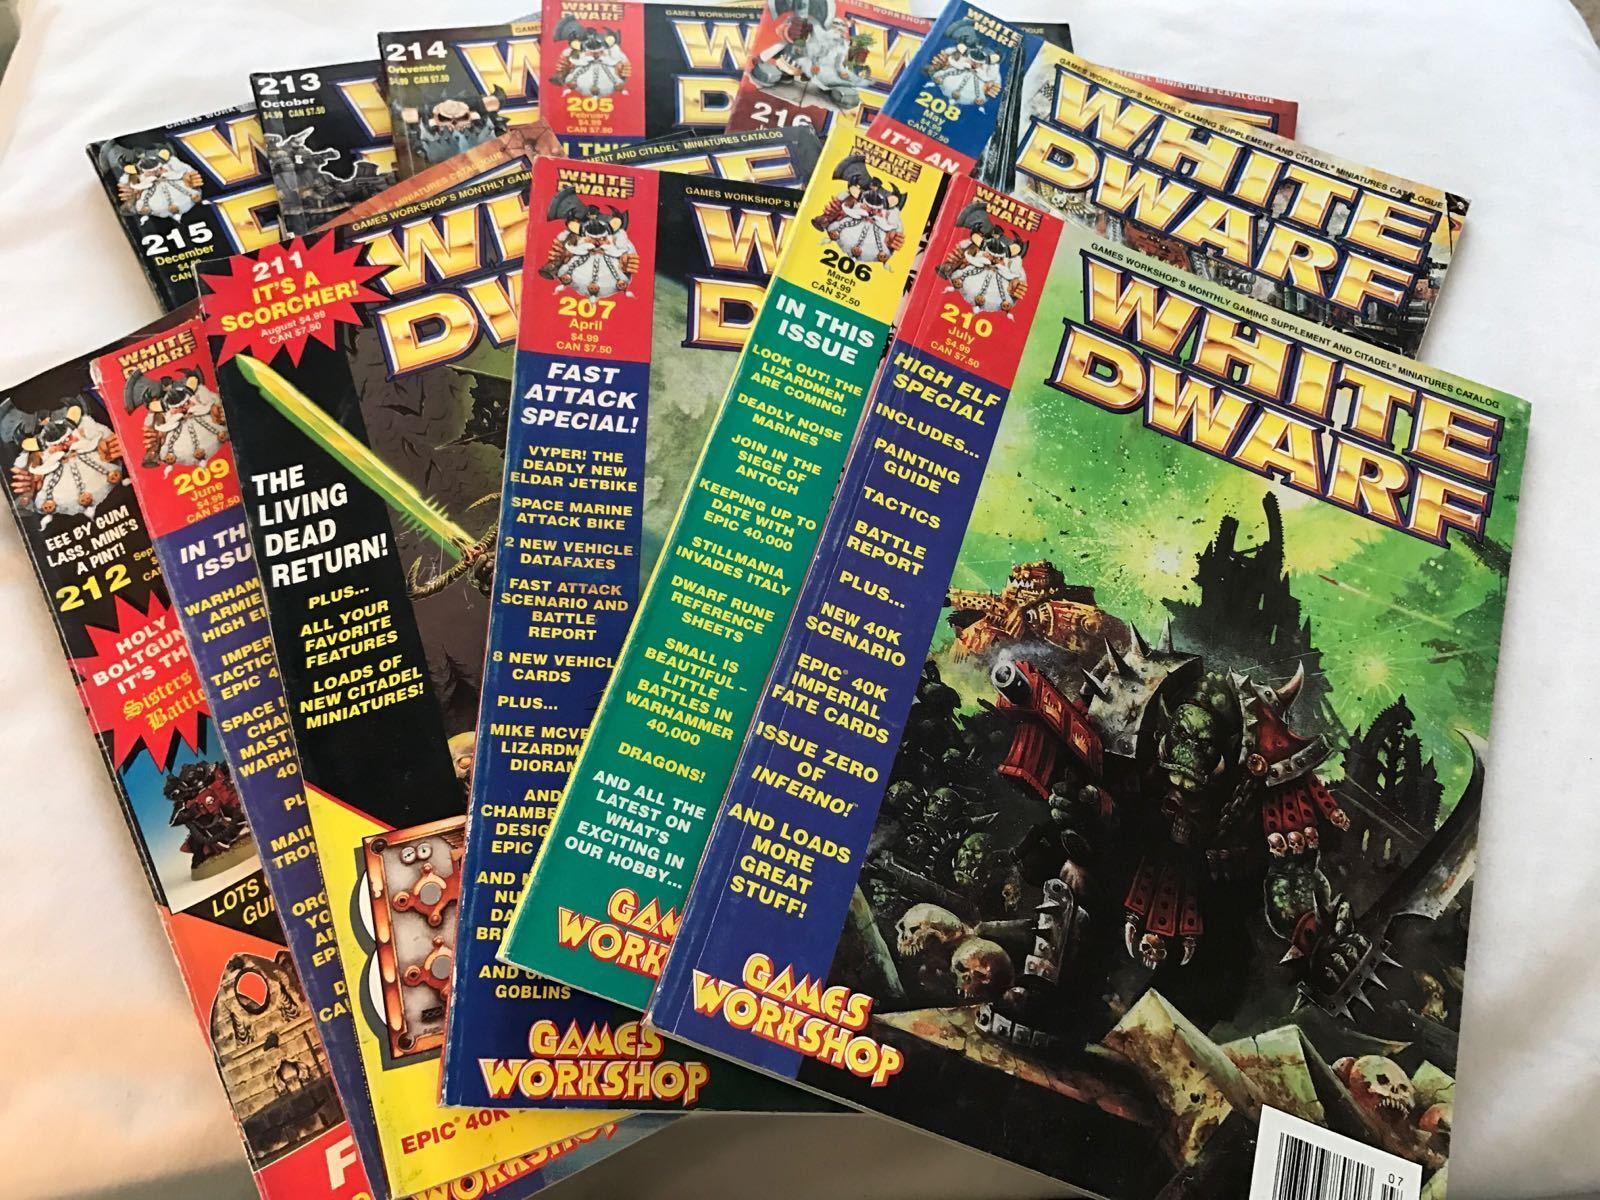 LOT OF 12 GAMES WORKSHOP WHITE DWARF WARHAMMER 40K MAGAZINES ISSUES 205-216 1997